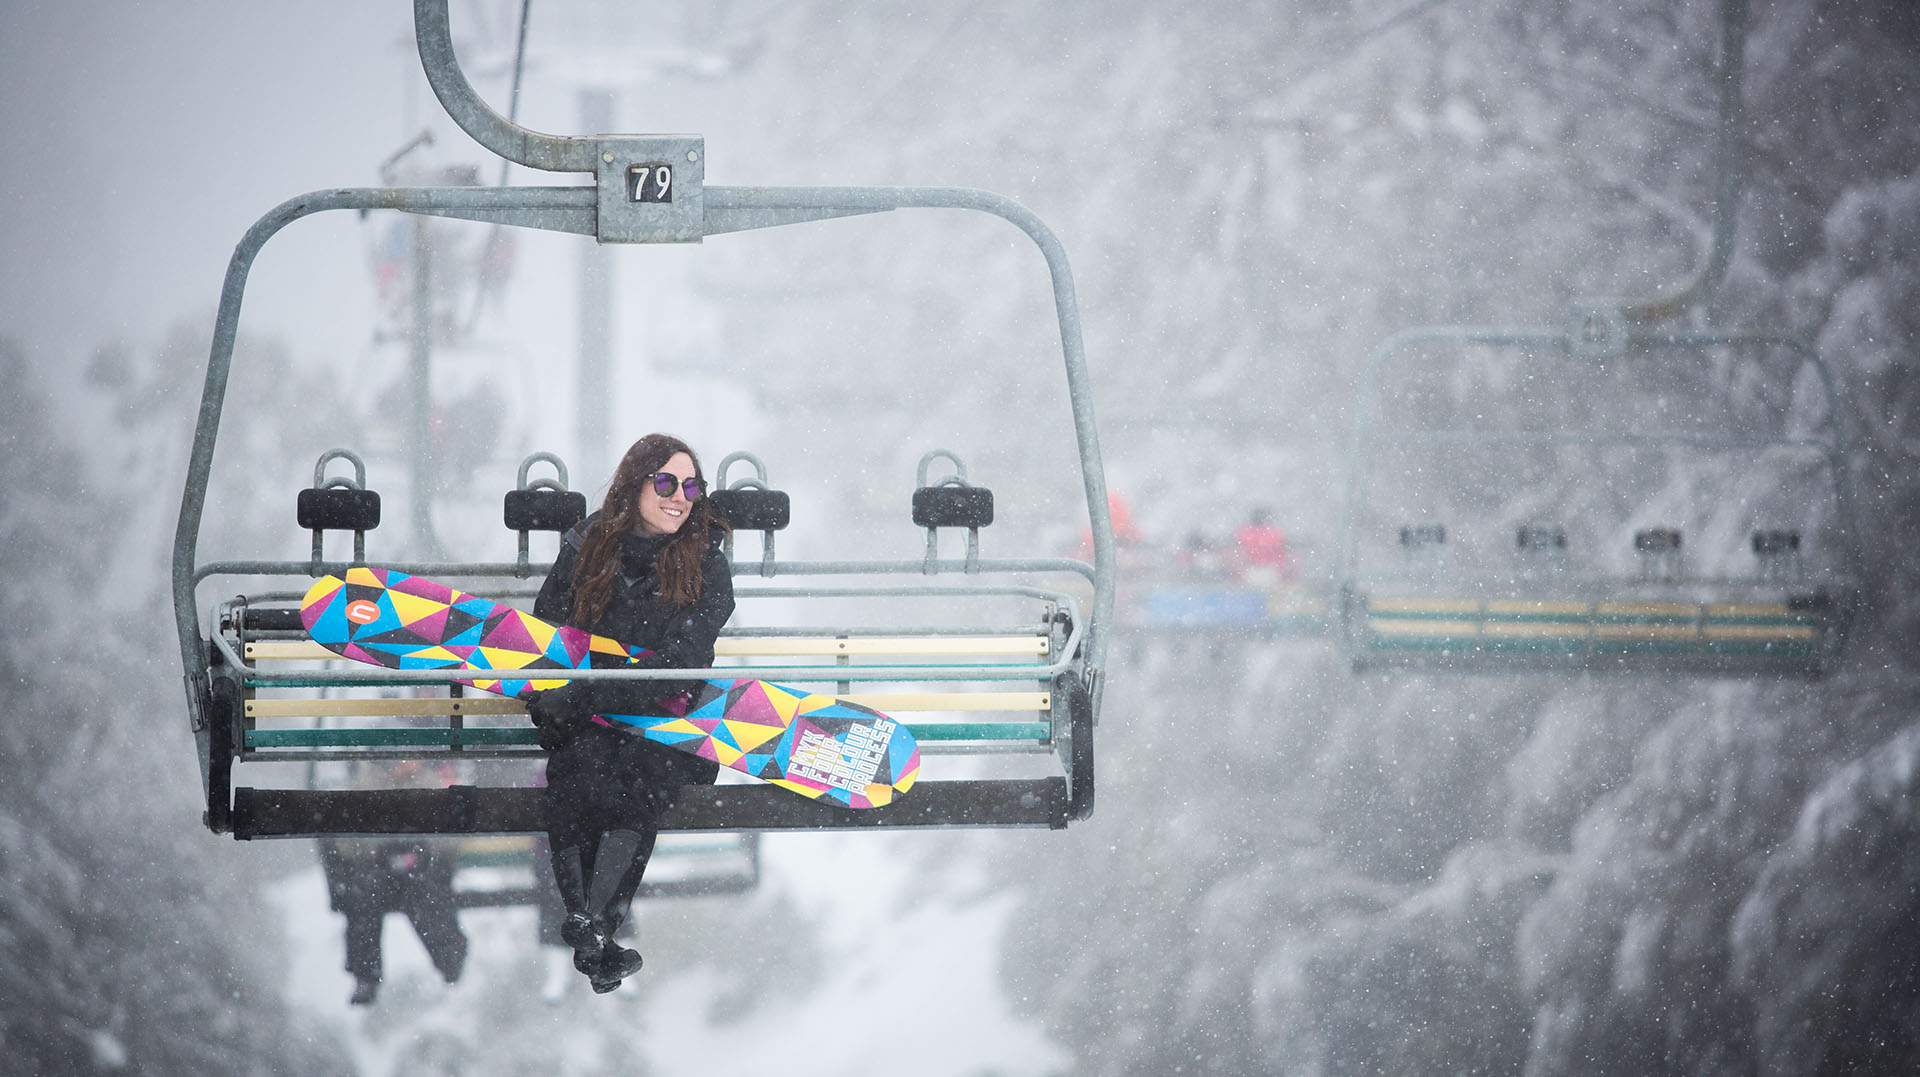 Snowboard 11